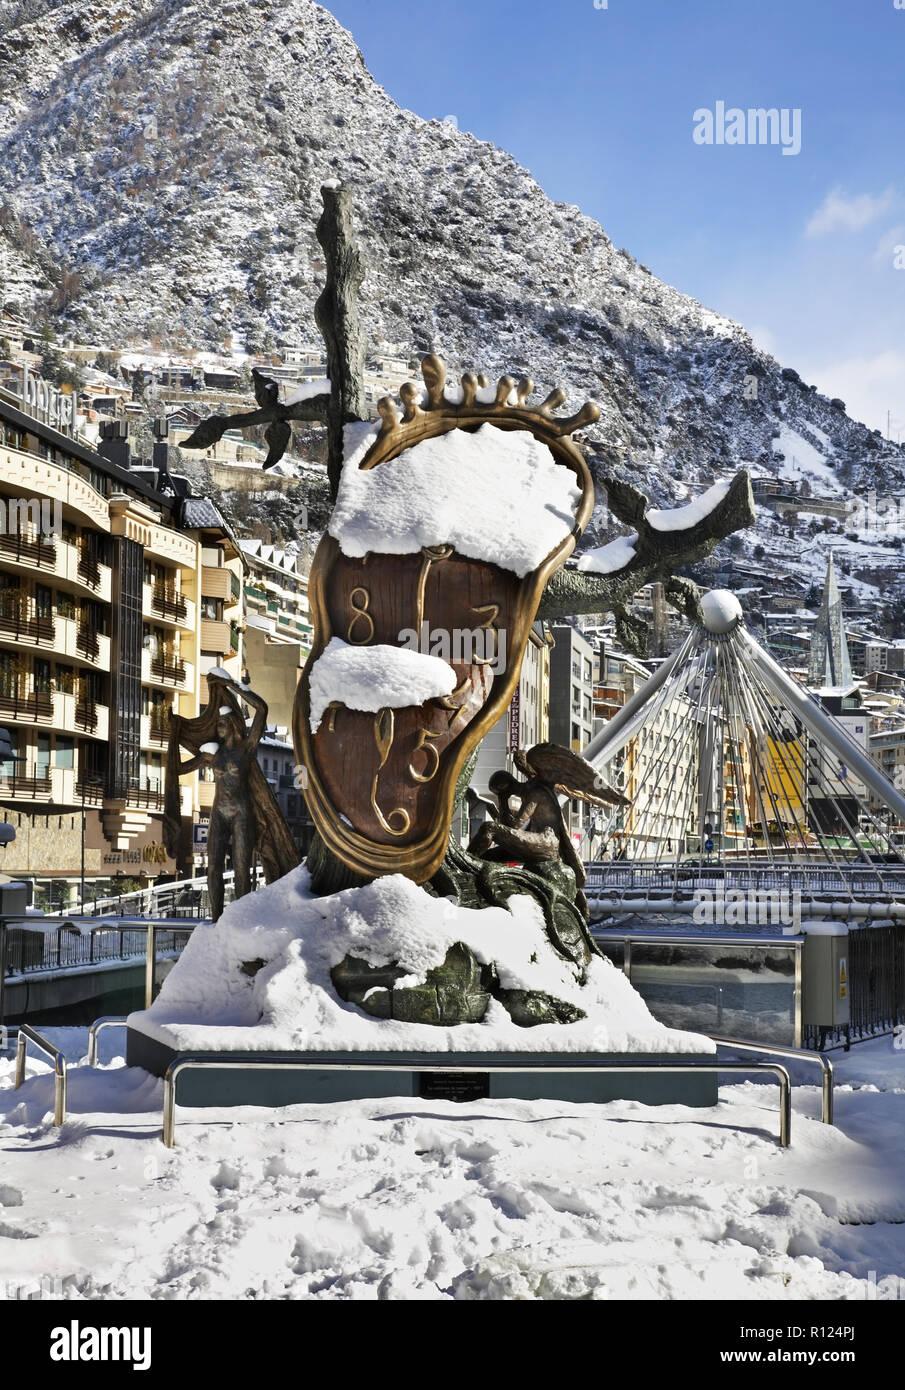 Salvador Dali sculpture, Nobility of Time in Andorra la Vella. Andorra Stock Photo